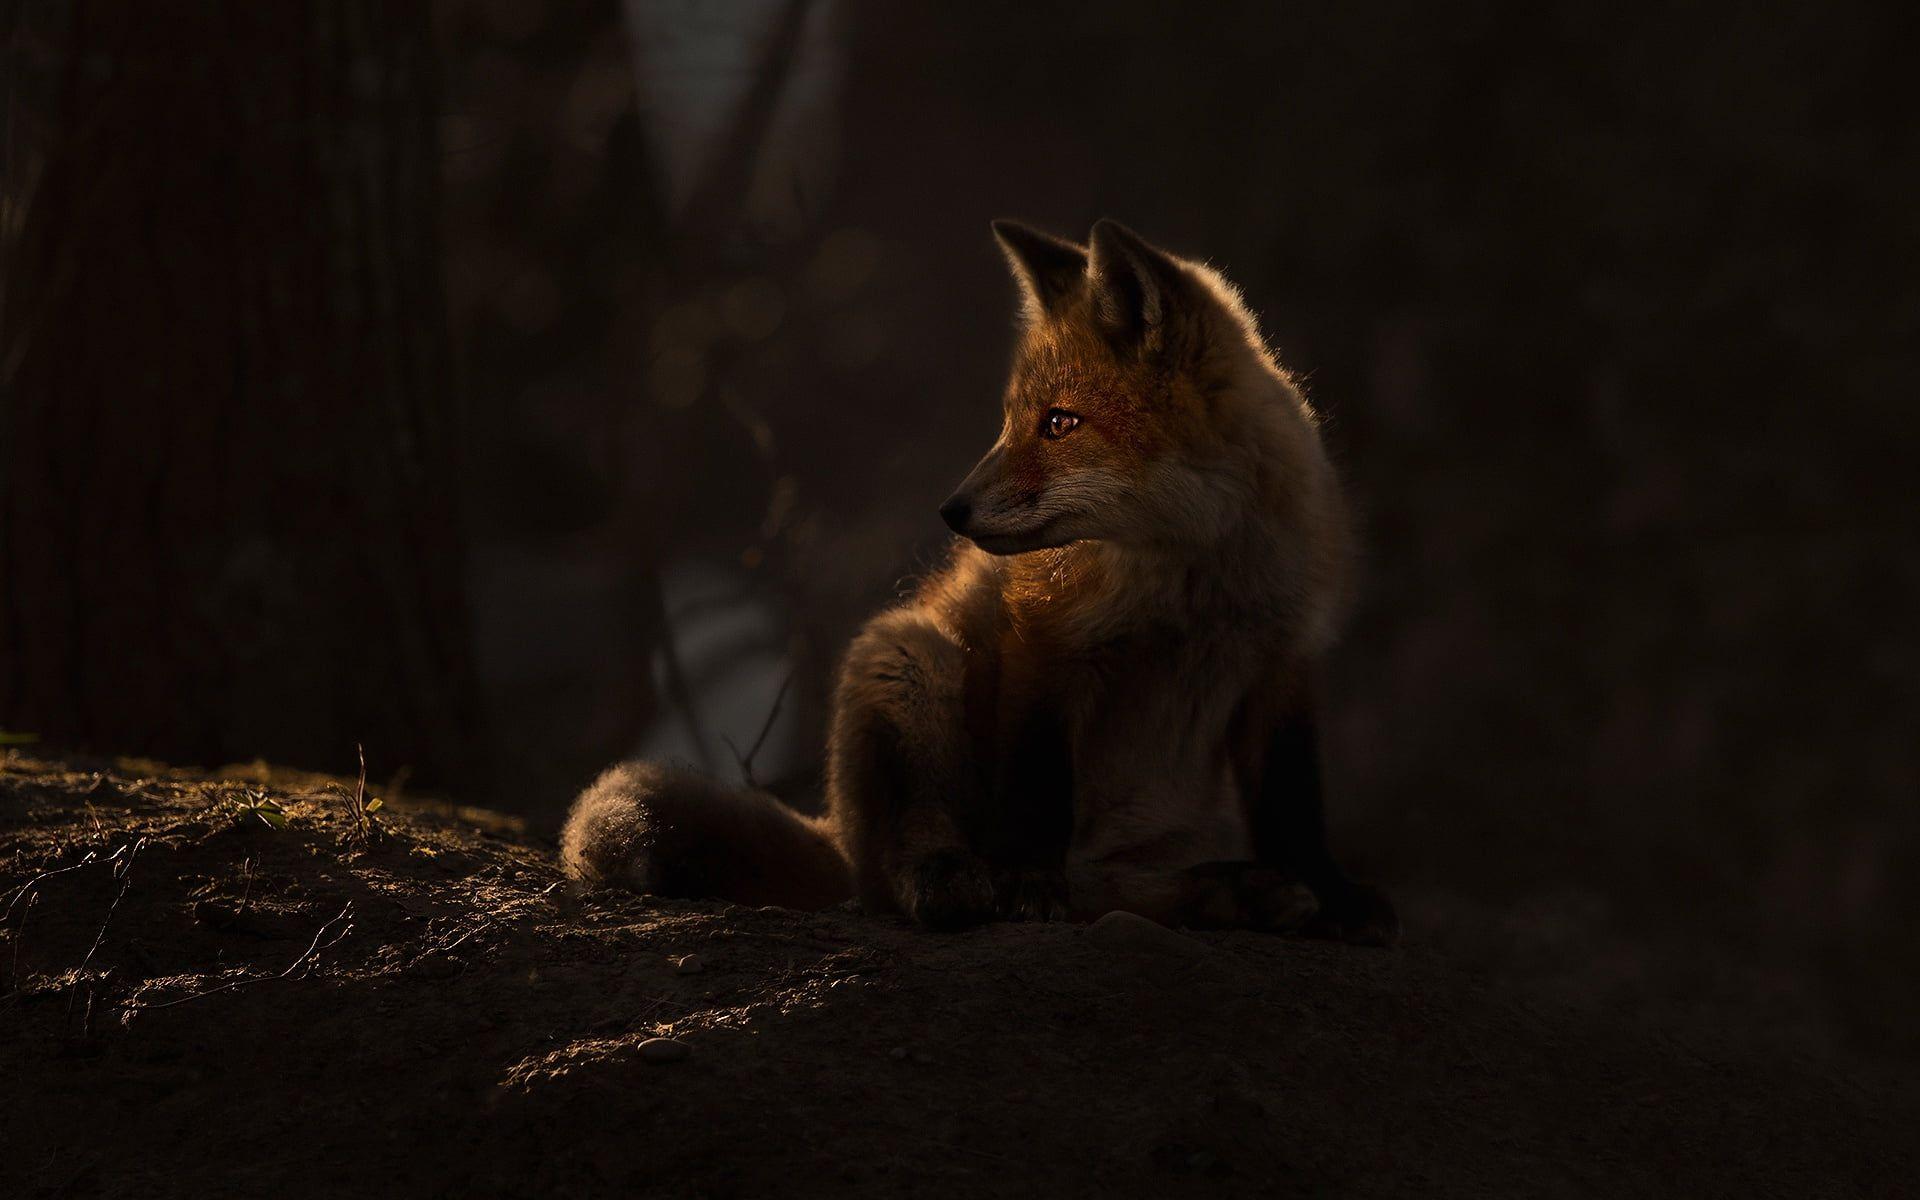 Dark Fox Animals Mammals 1080p Wallpaper Hdwallpaper Desktop 2020